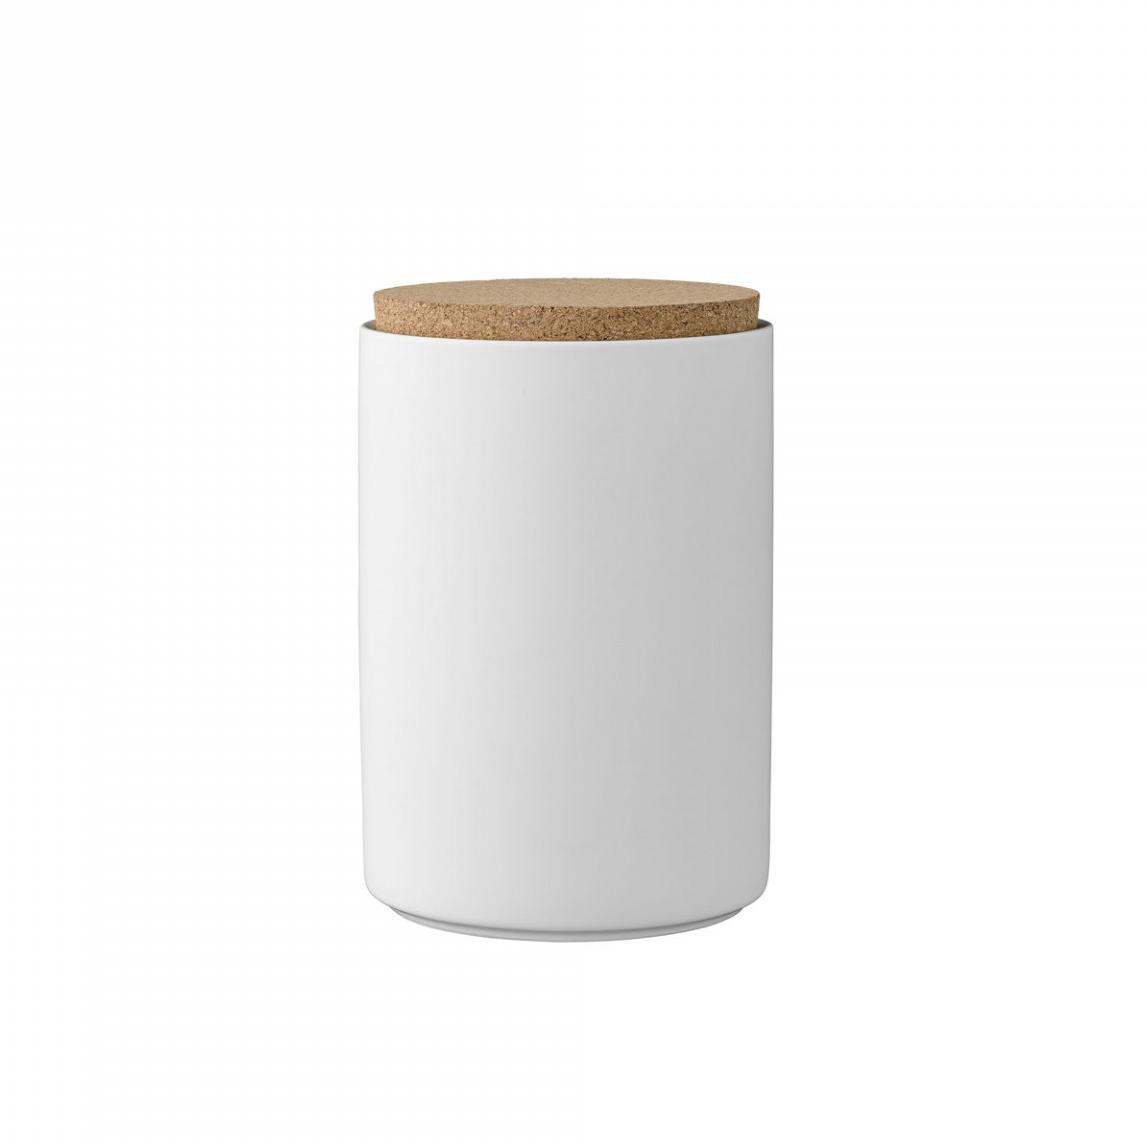 Pote em porcelana, tampa de cortiça, branco, Ø11x16